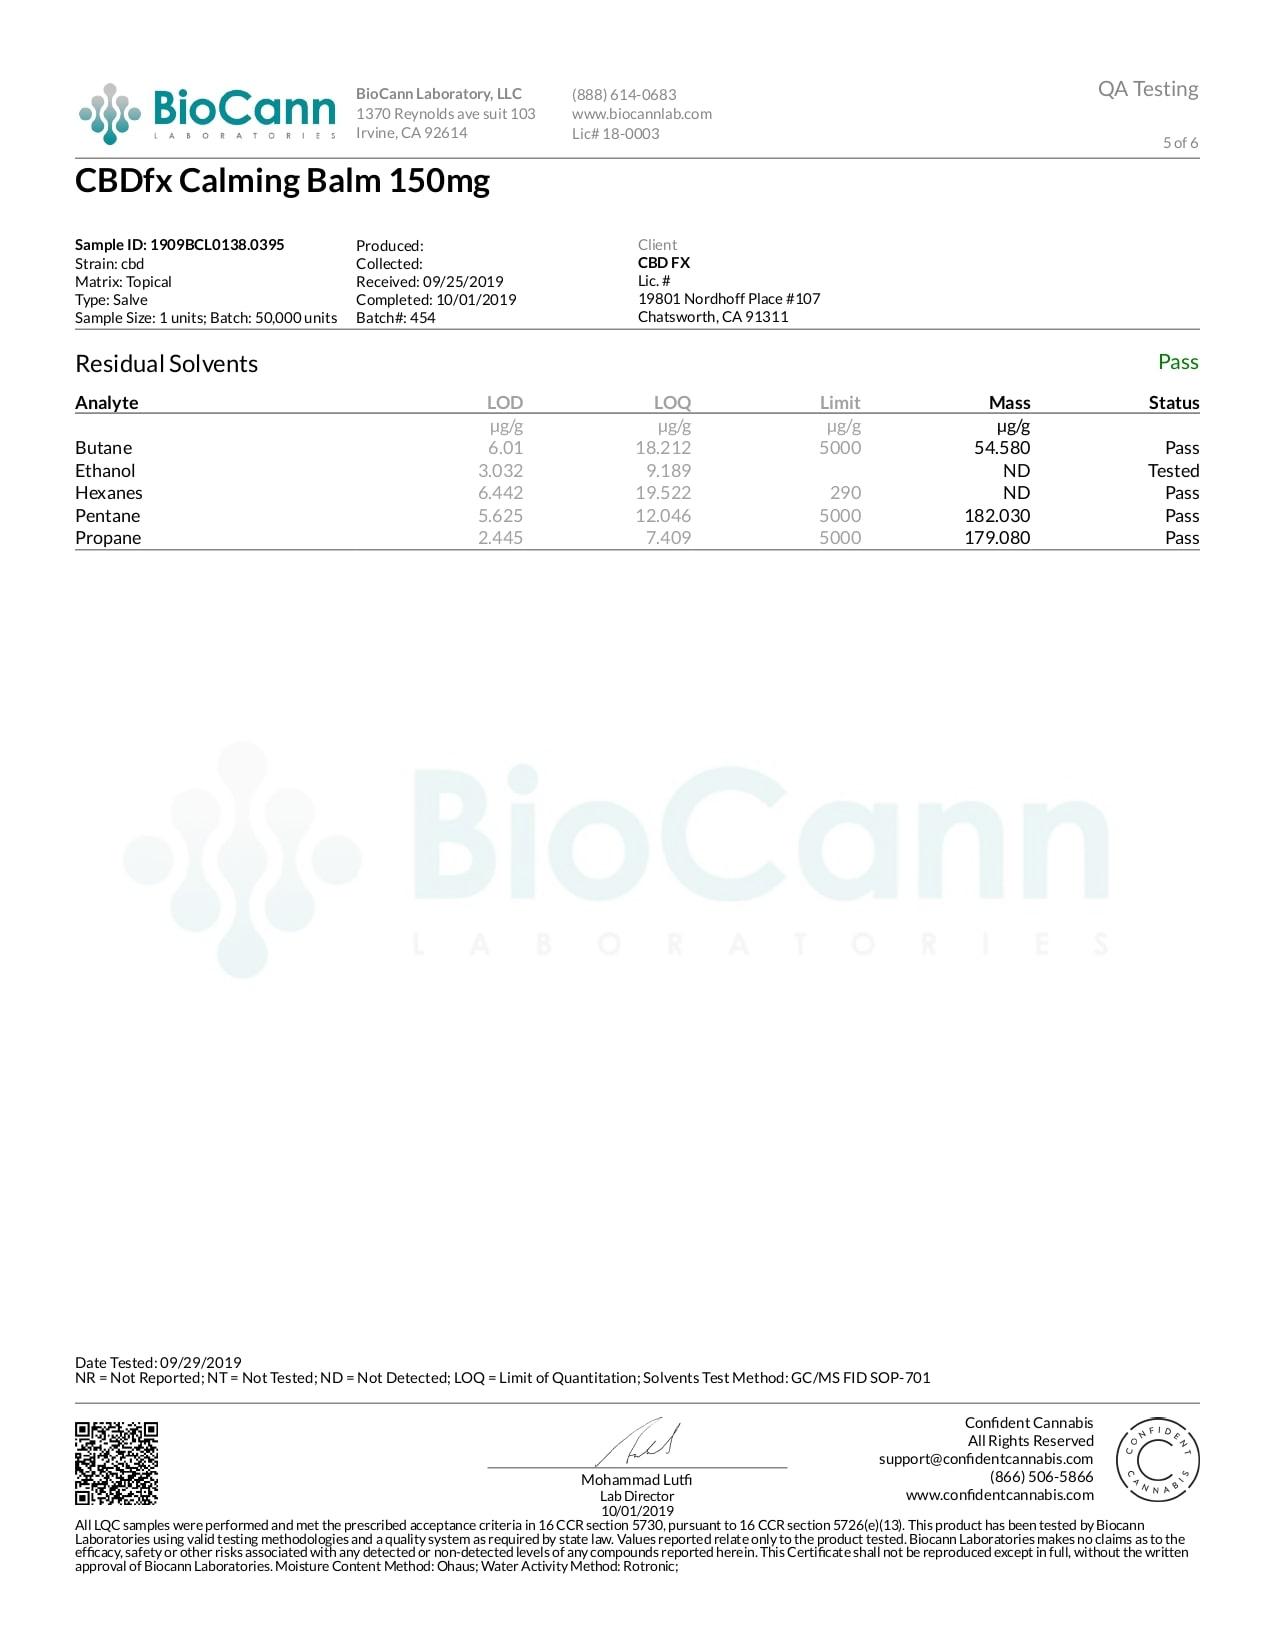 CBDfx CBD Calming Balm Lab Report Broad Spectrum 150mg